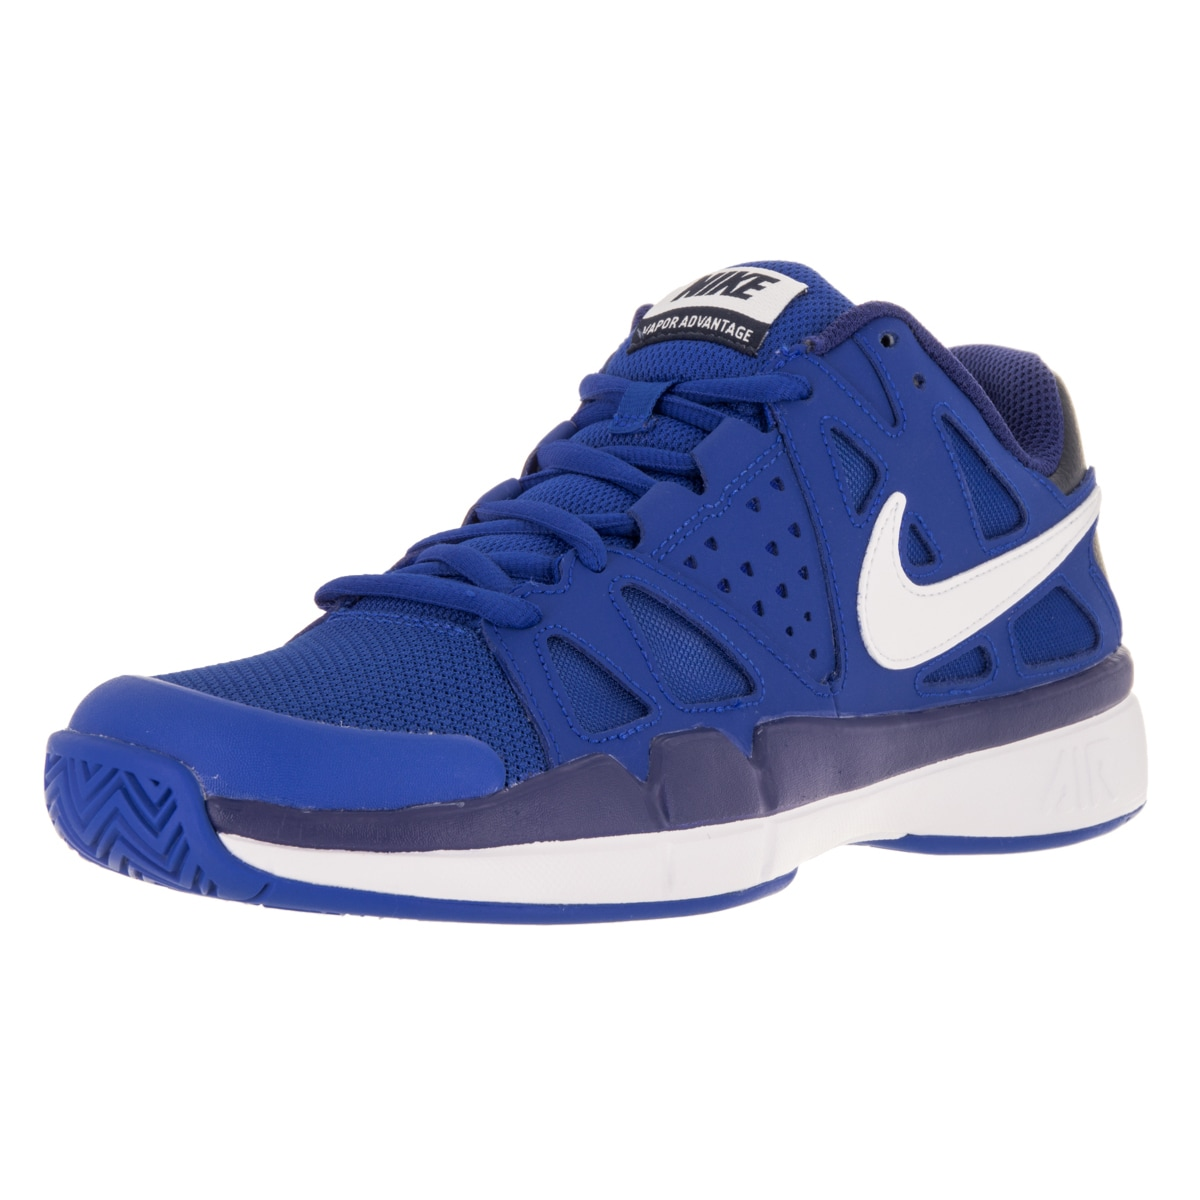 Nike Men's Air Vapor Advantage White and Royal Blue Mesh Tennis Shoes